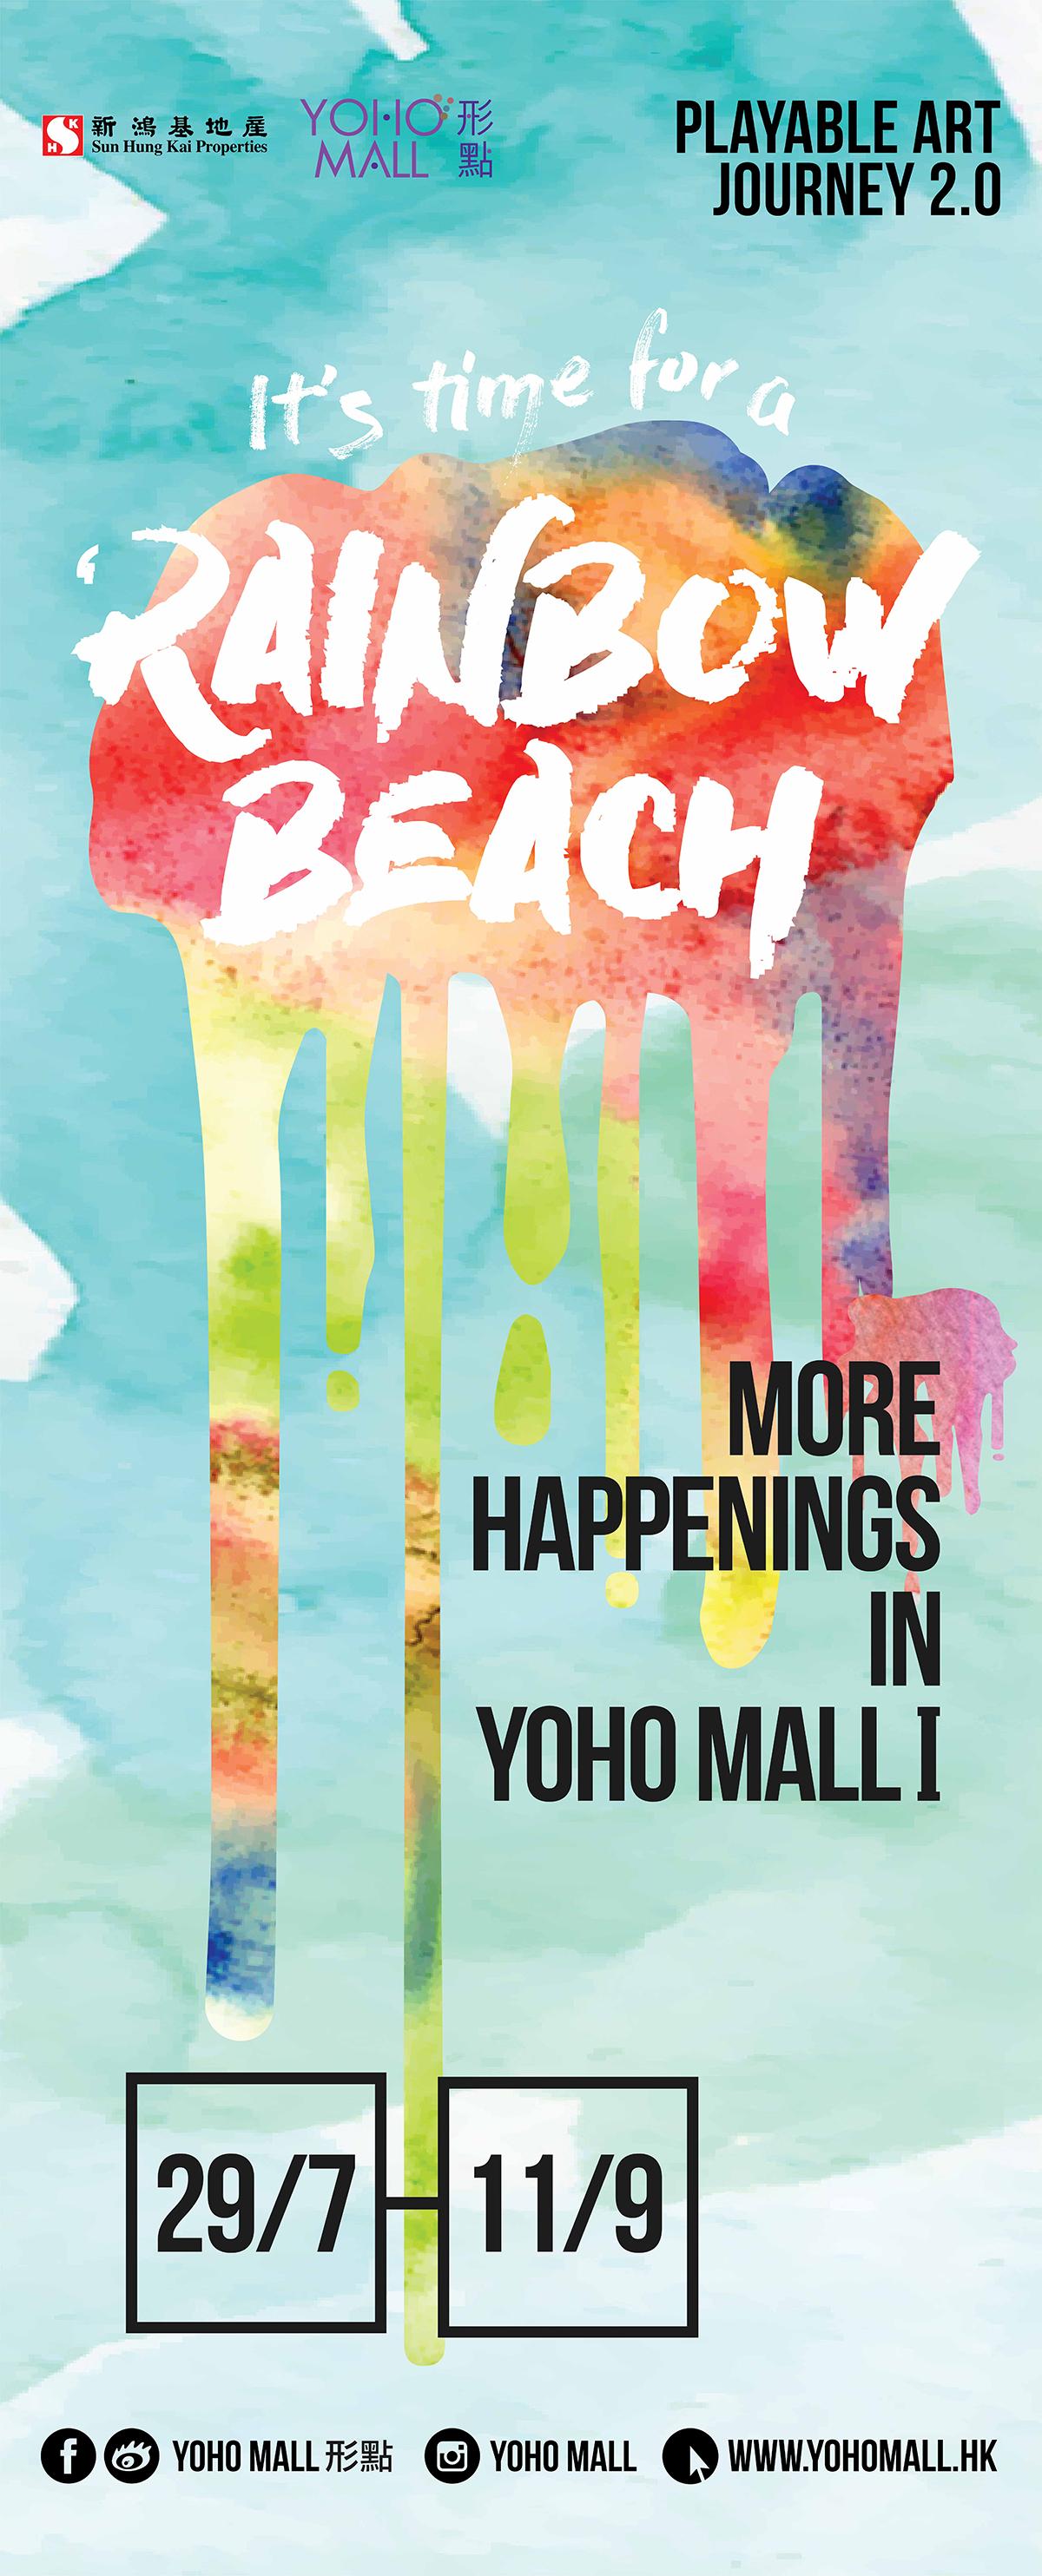 GRAPHICS DESIGN FOR YOHO MALL SUMMER CAMPAIGN - 2016